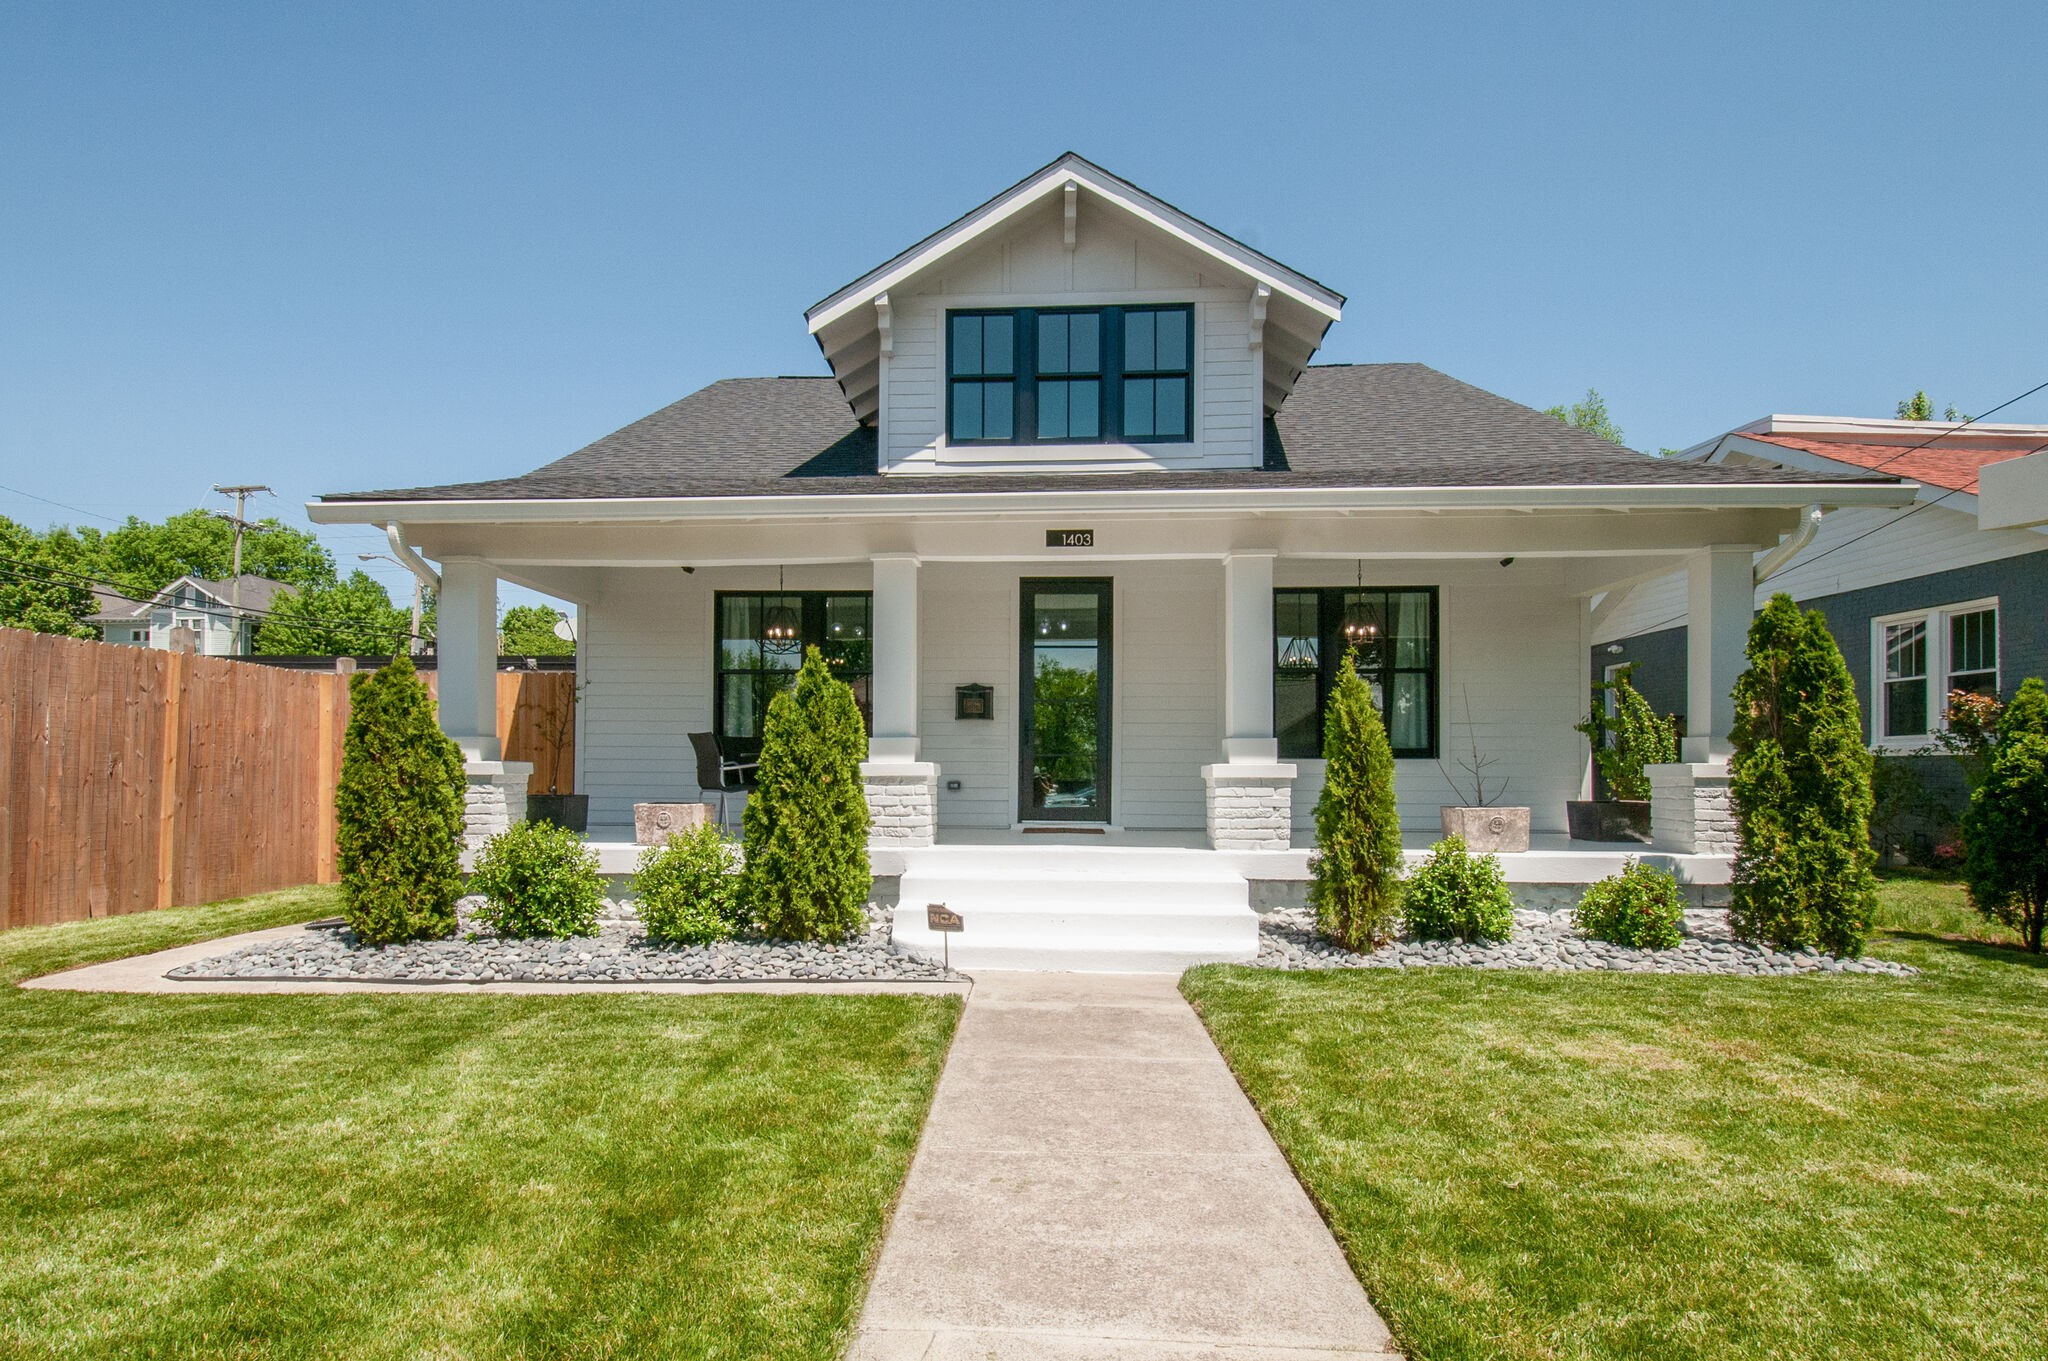 1403 Woodland St Property Photo - Nashville, TN real estate listing